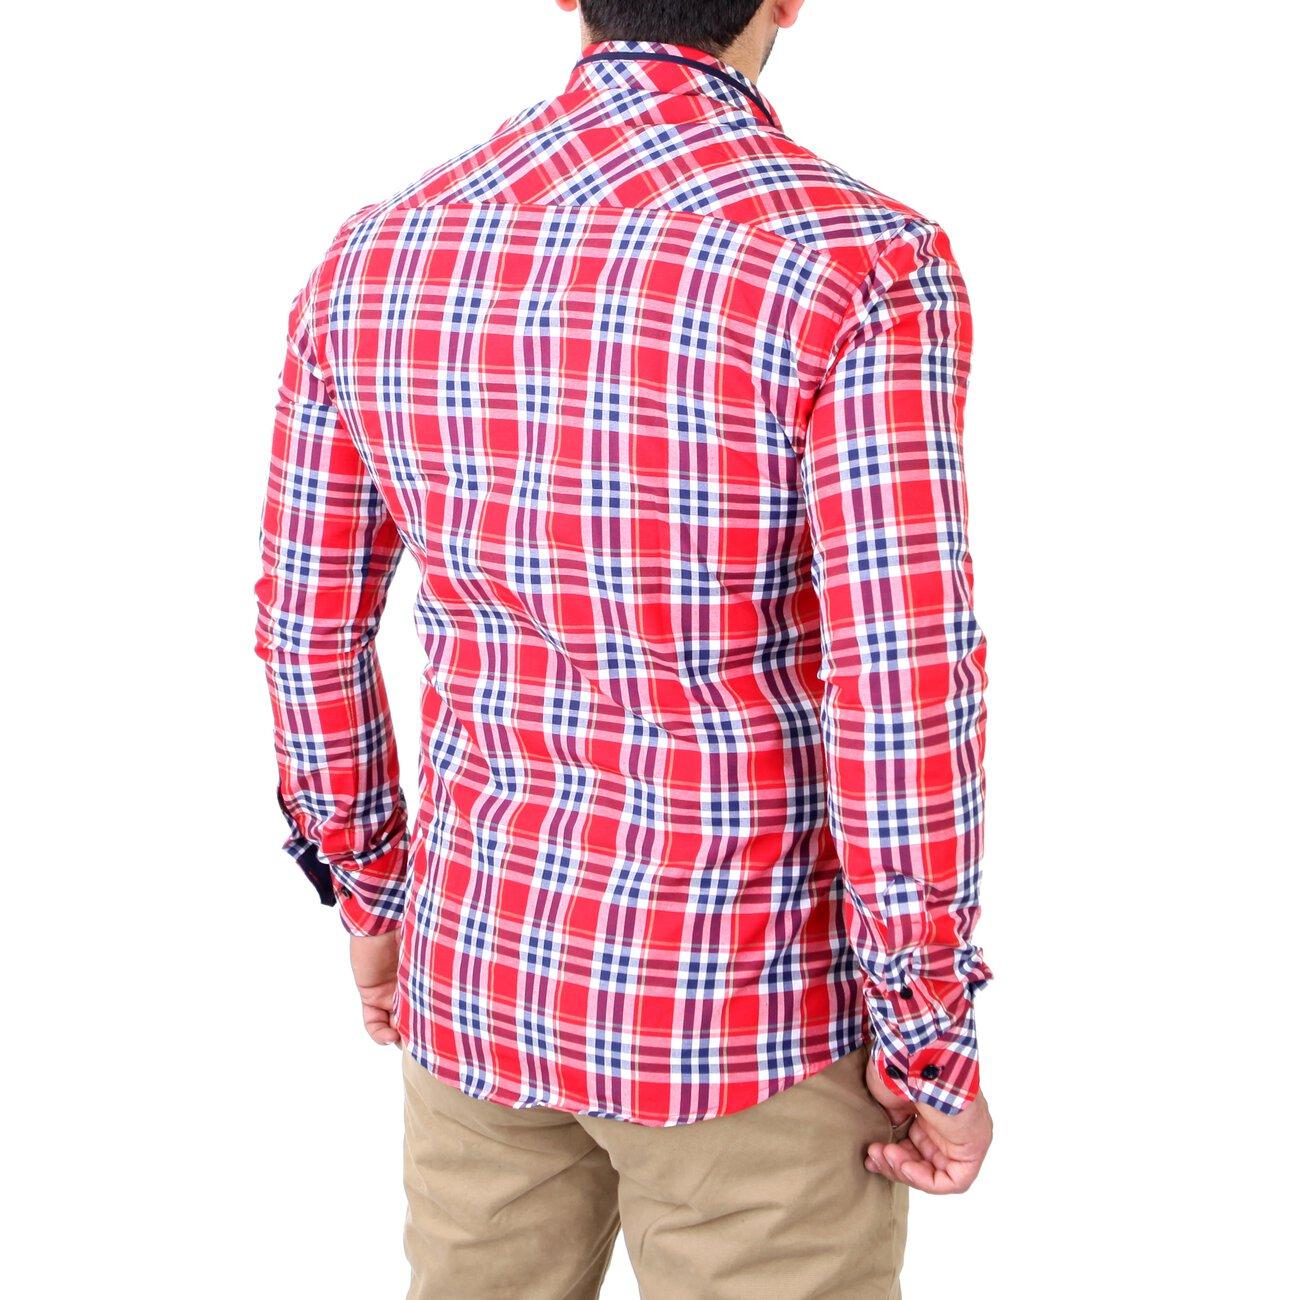 Reslad Herren Hemd Tartan Karo Design G Nstig Kaufen